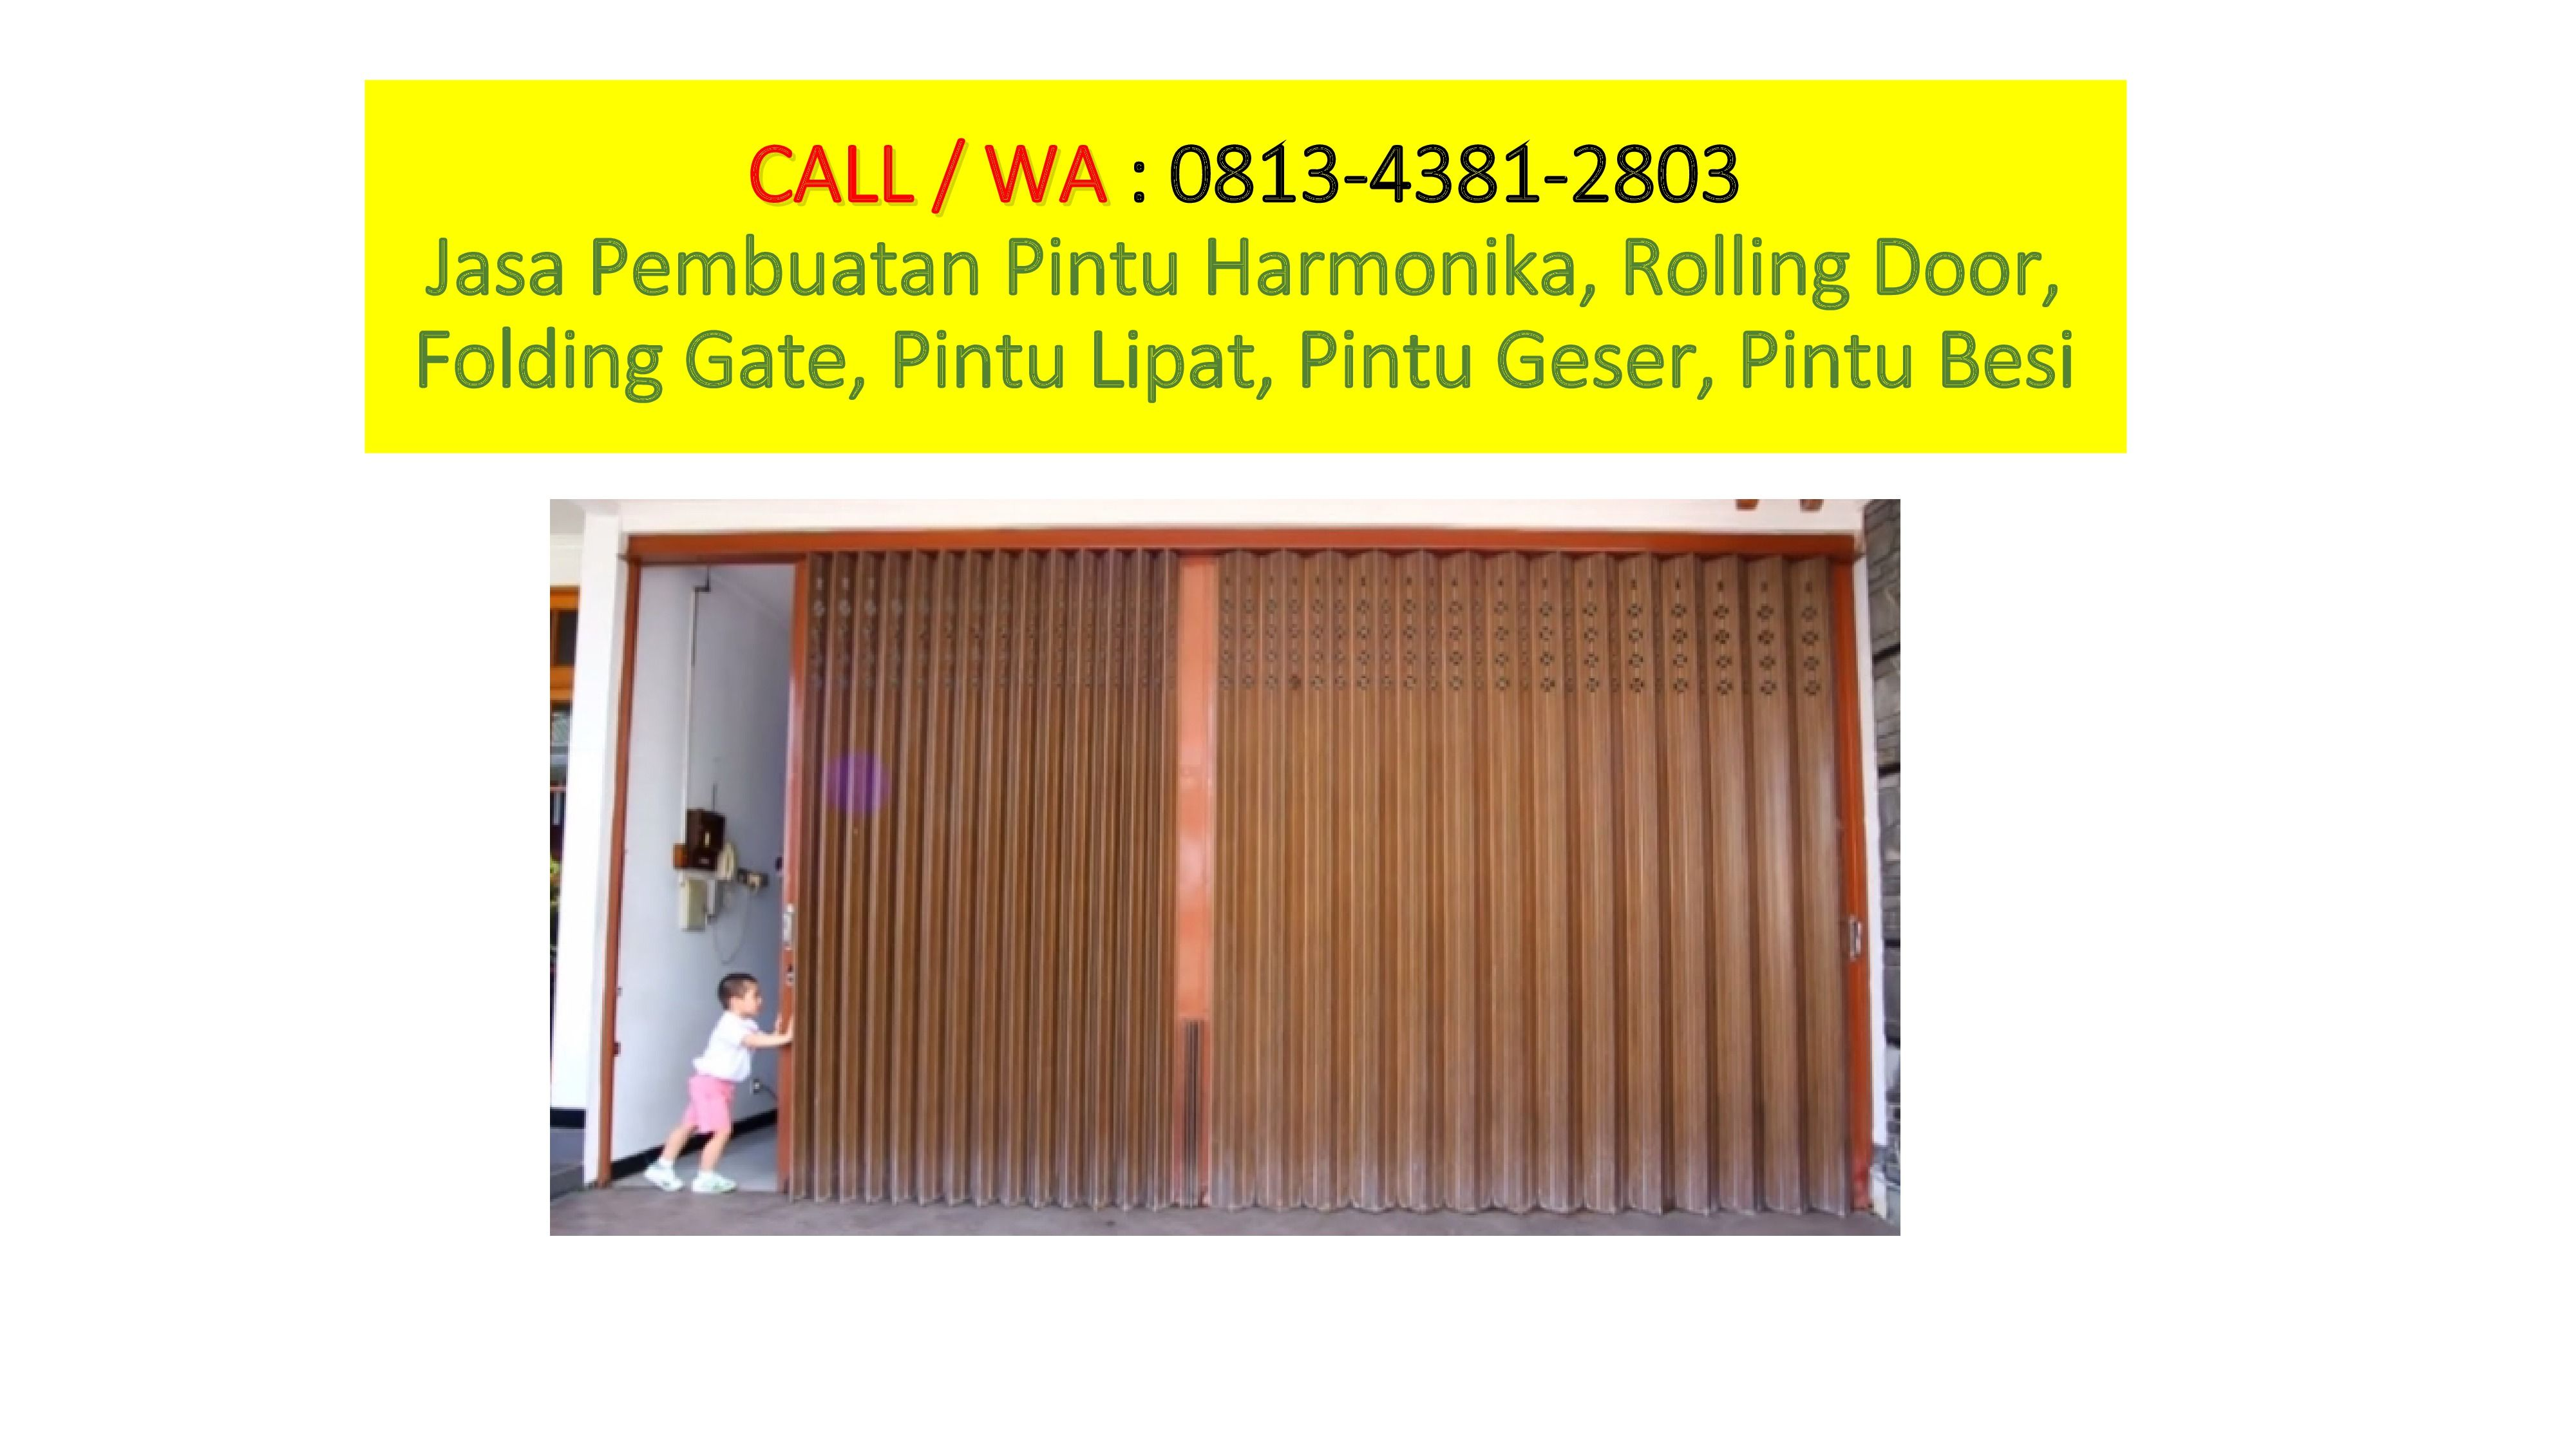 TELP / WA: 0813 4381 2803 Varia harmonica door in Surabaya, P …